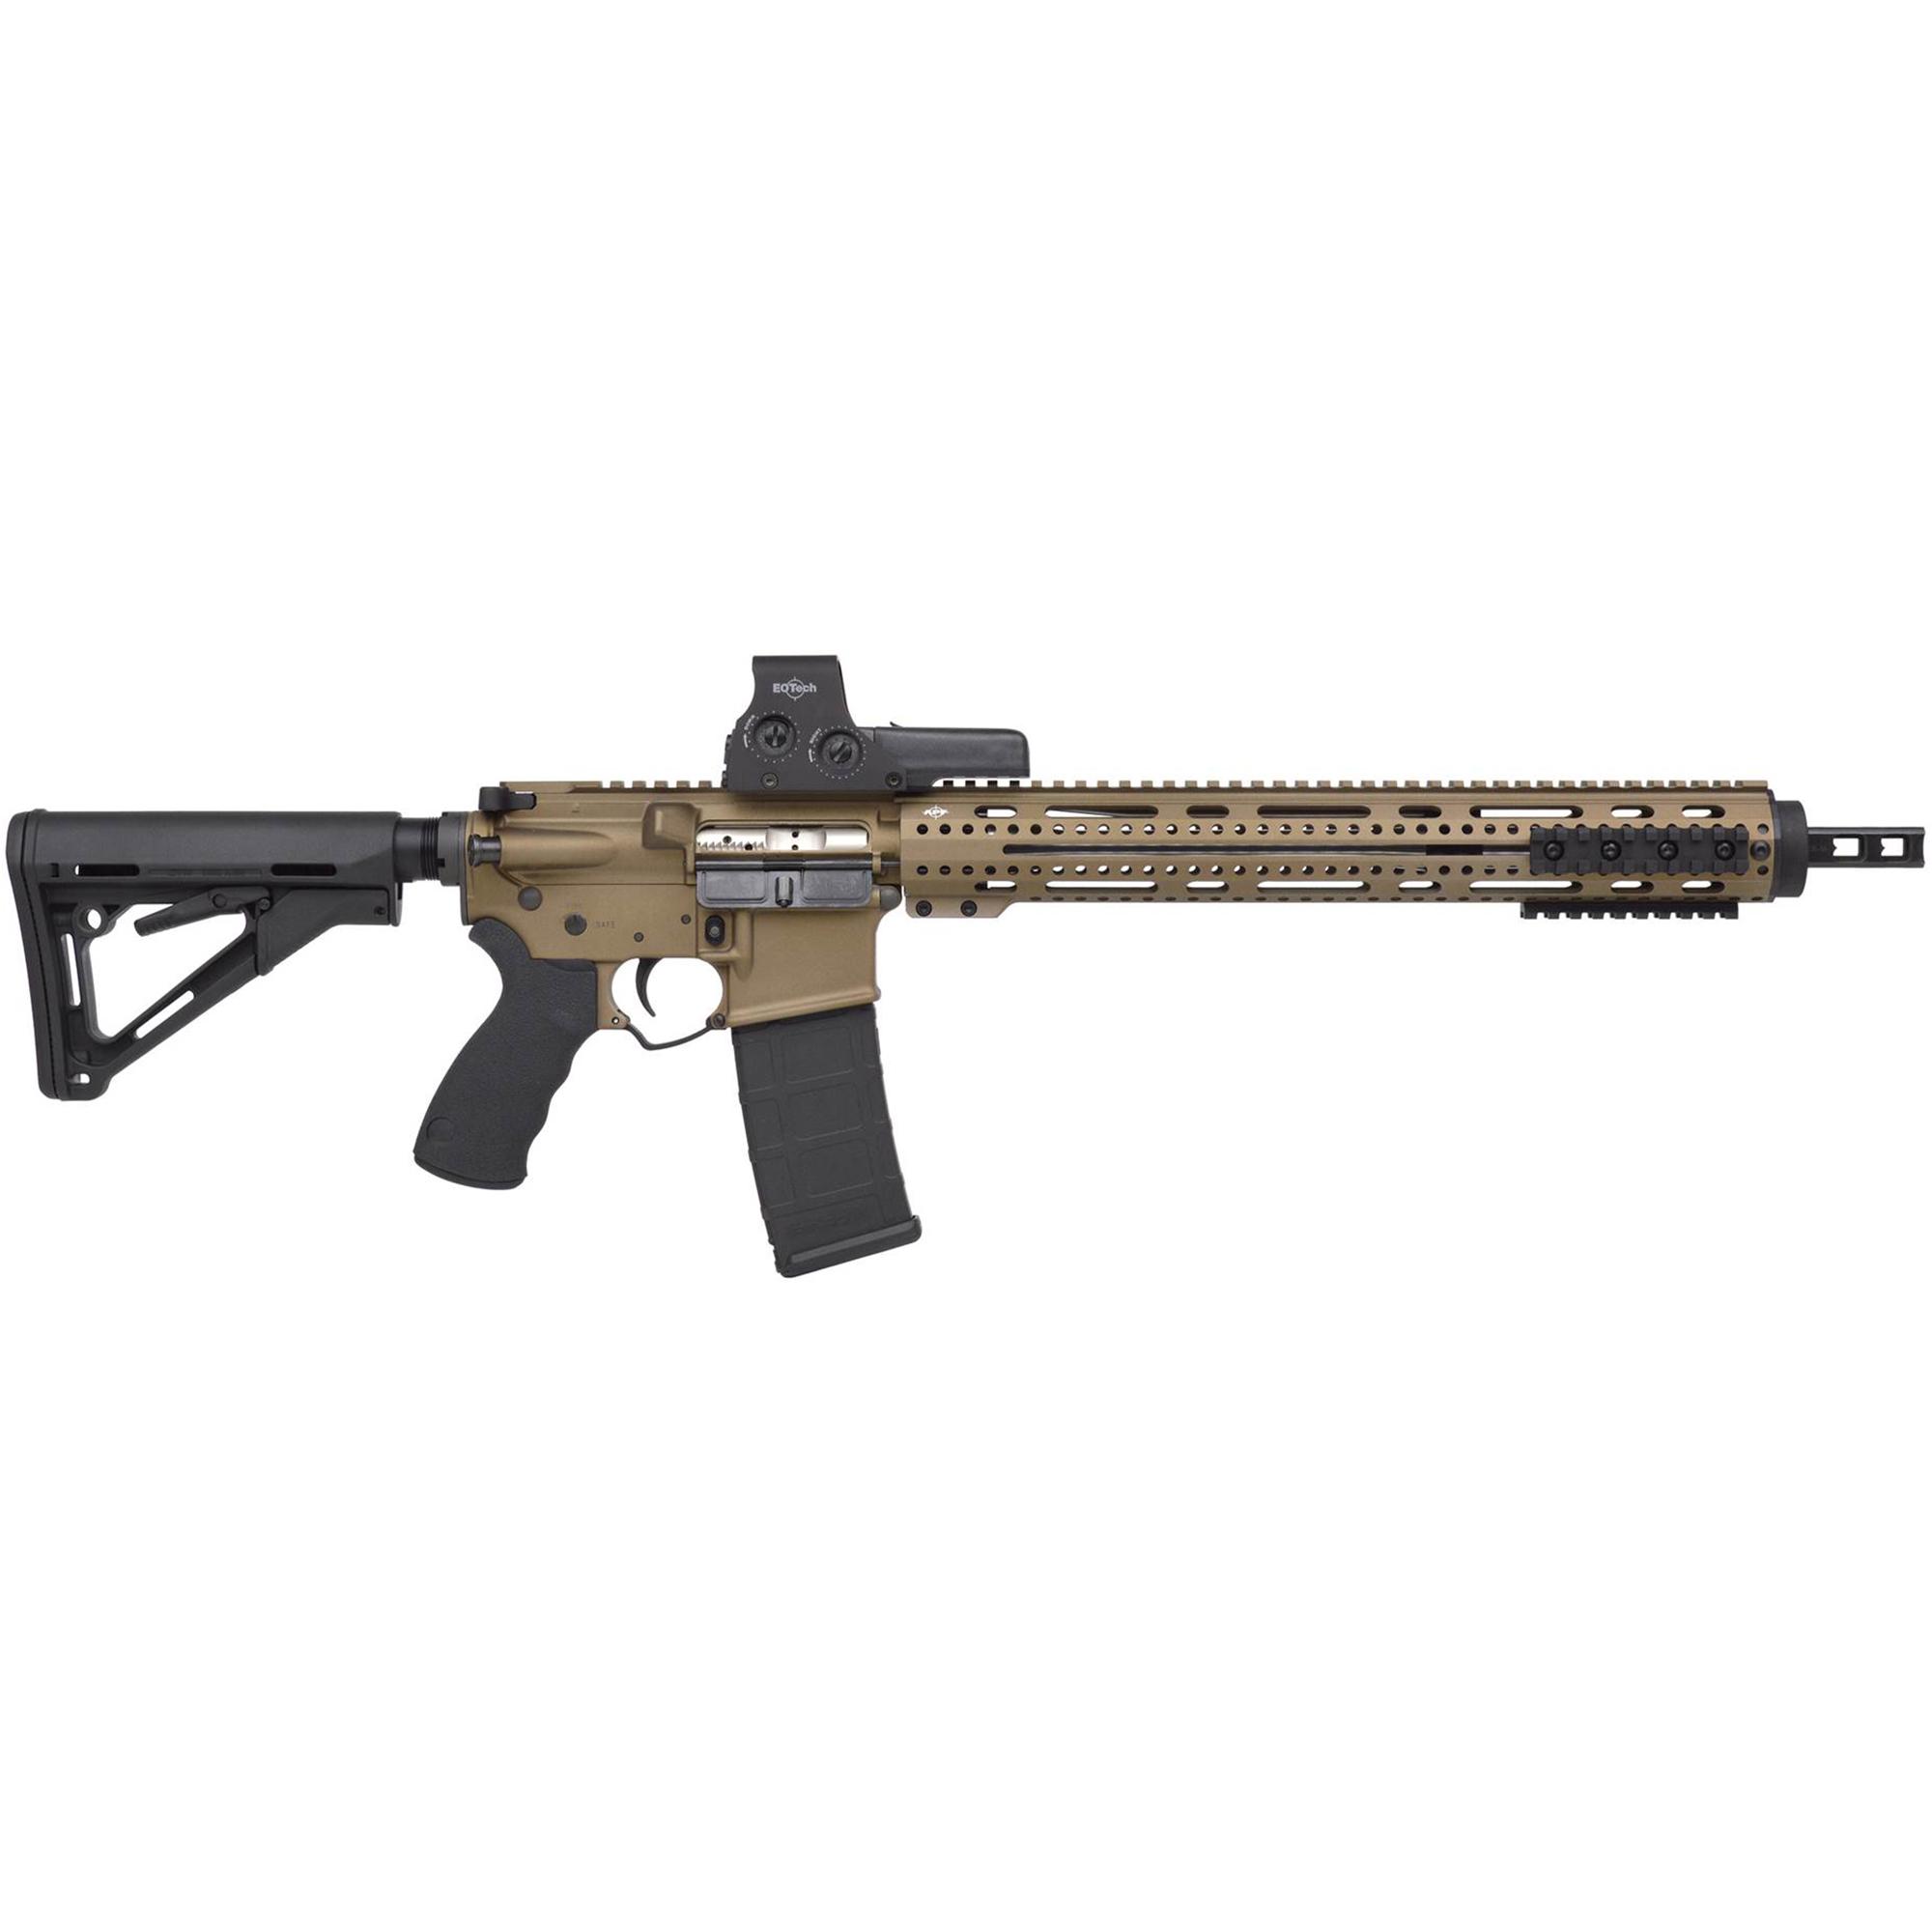 Alex Pro Firearms Match Carbine EOTECH Centerfire Rifle Package, Bronze thumbnail